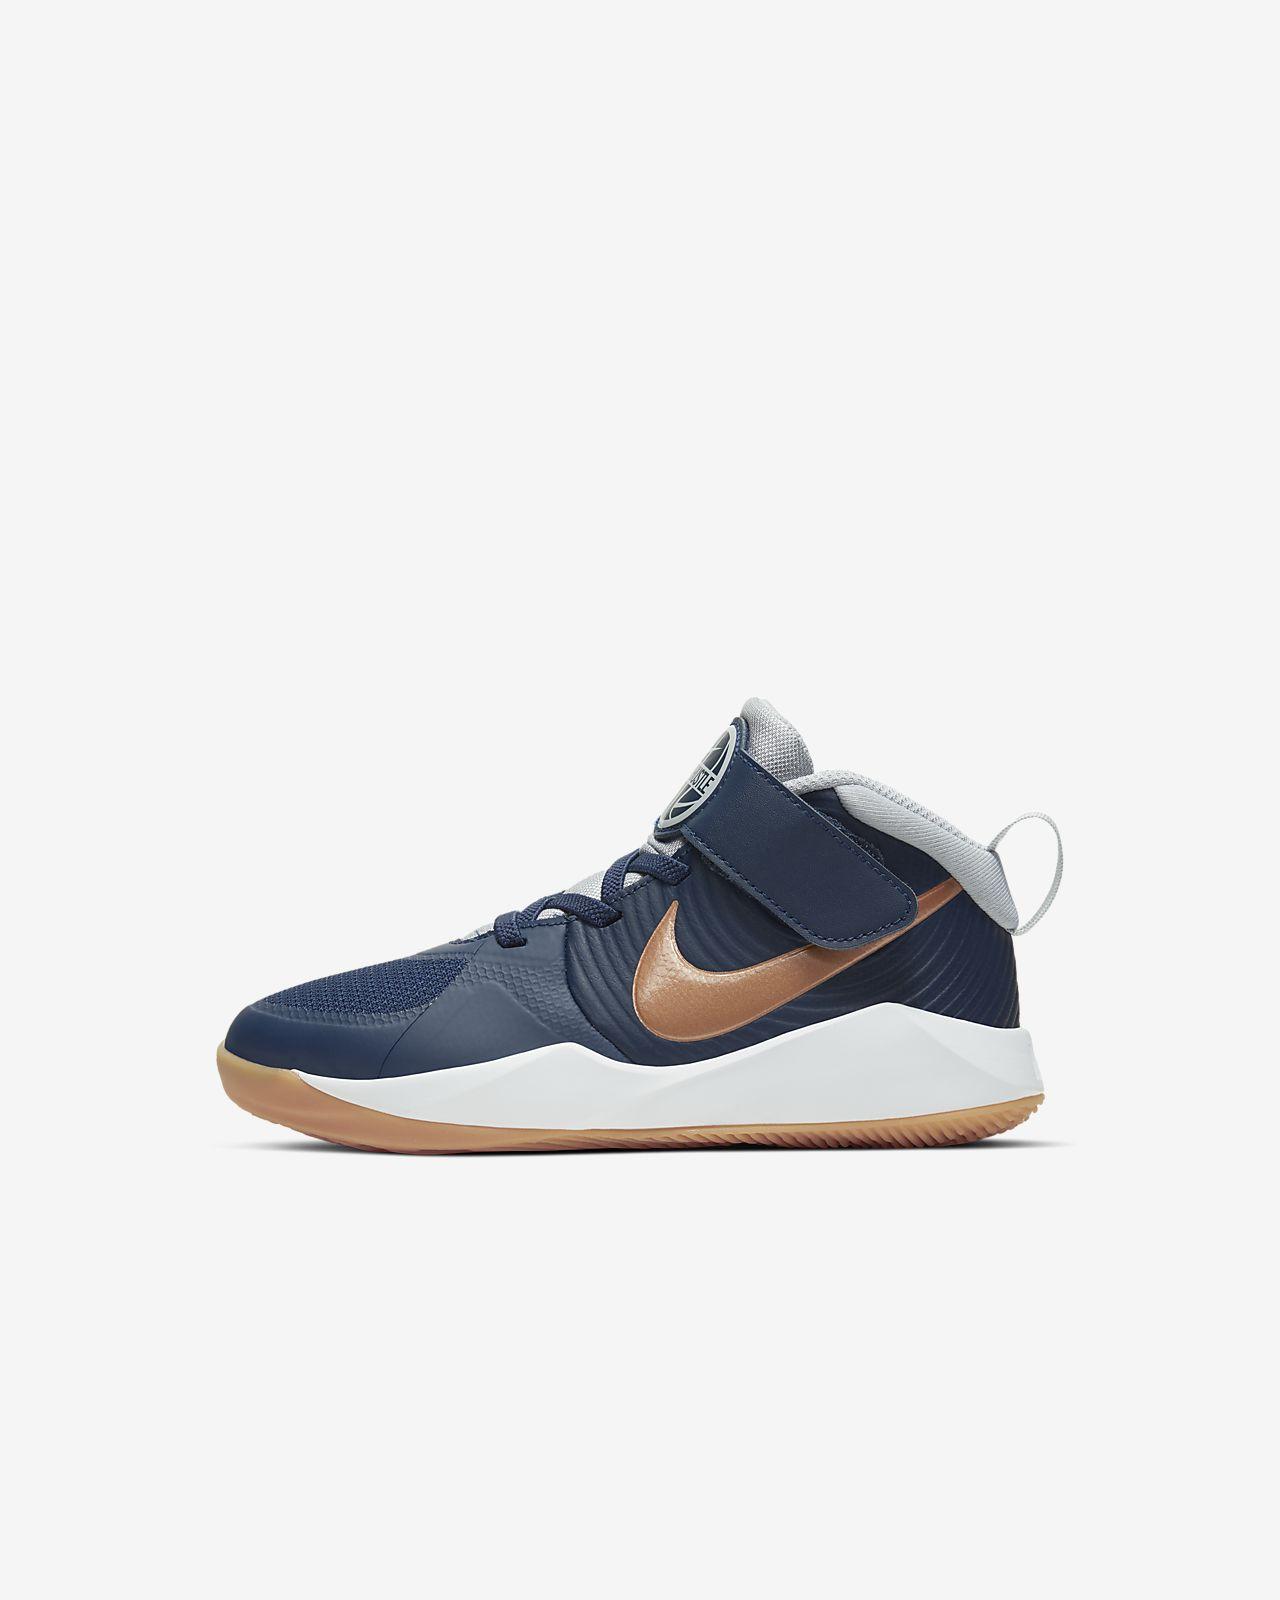 Nike Team Hustle D 9 Younger Kids' Shoe